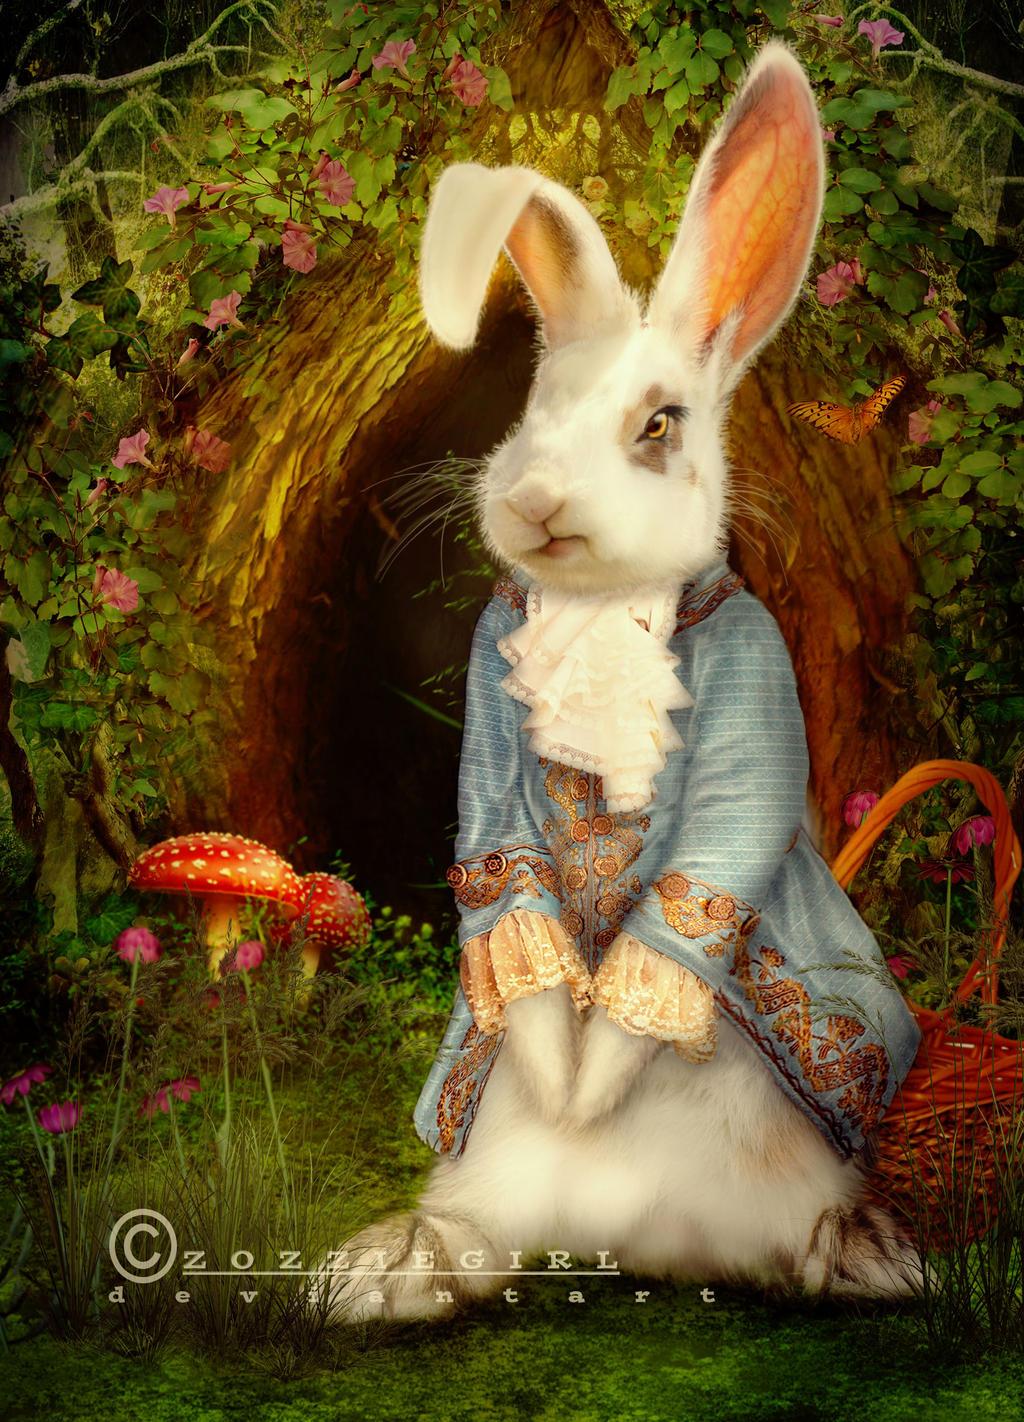 E.B aka Easter Bunny by Zozziegirl